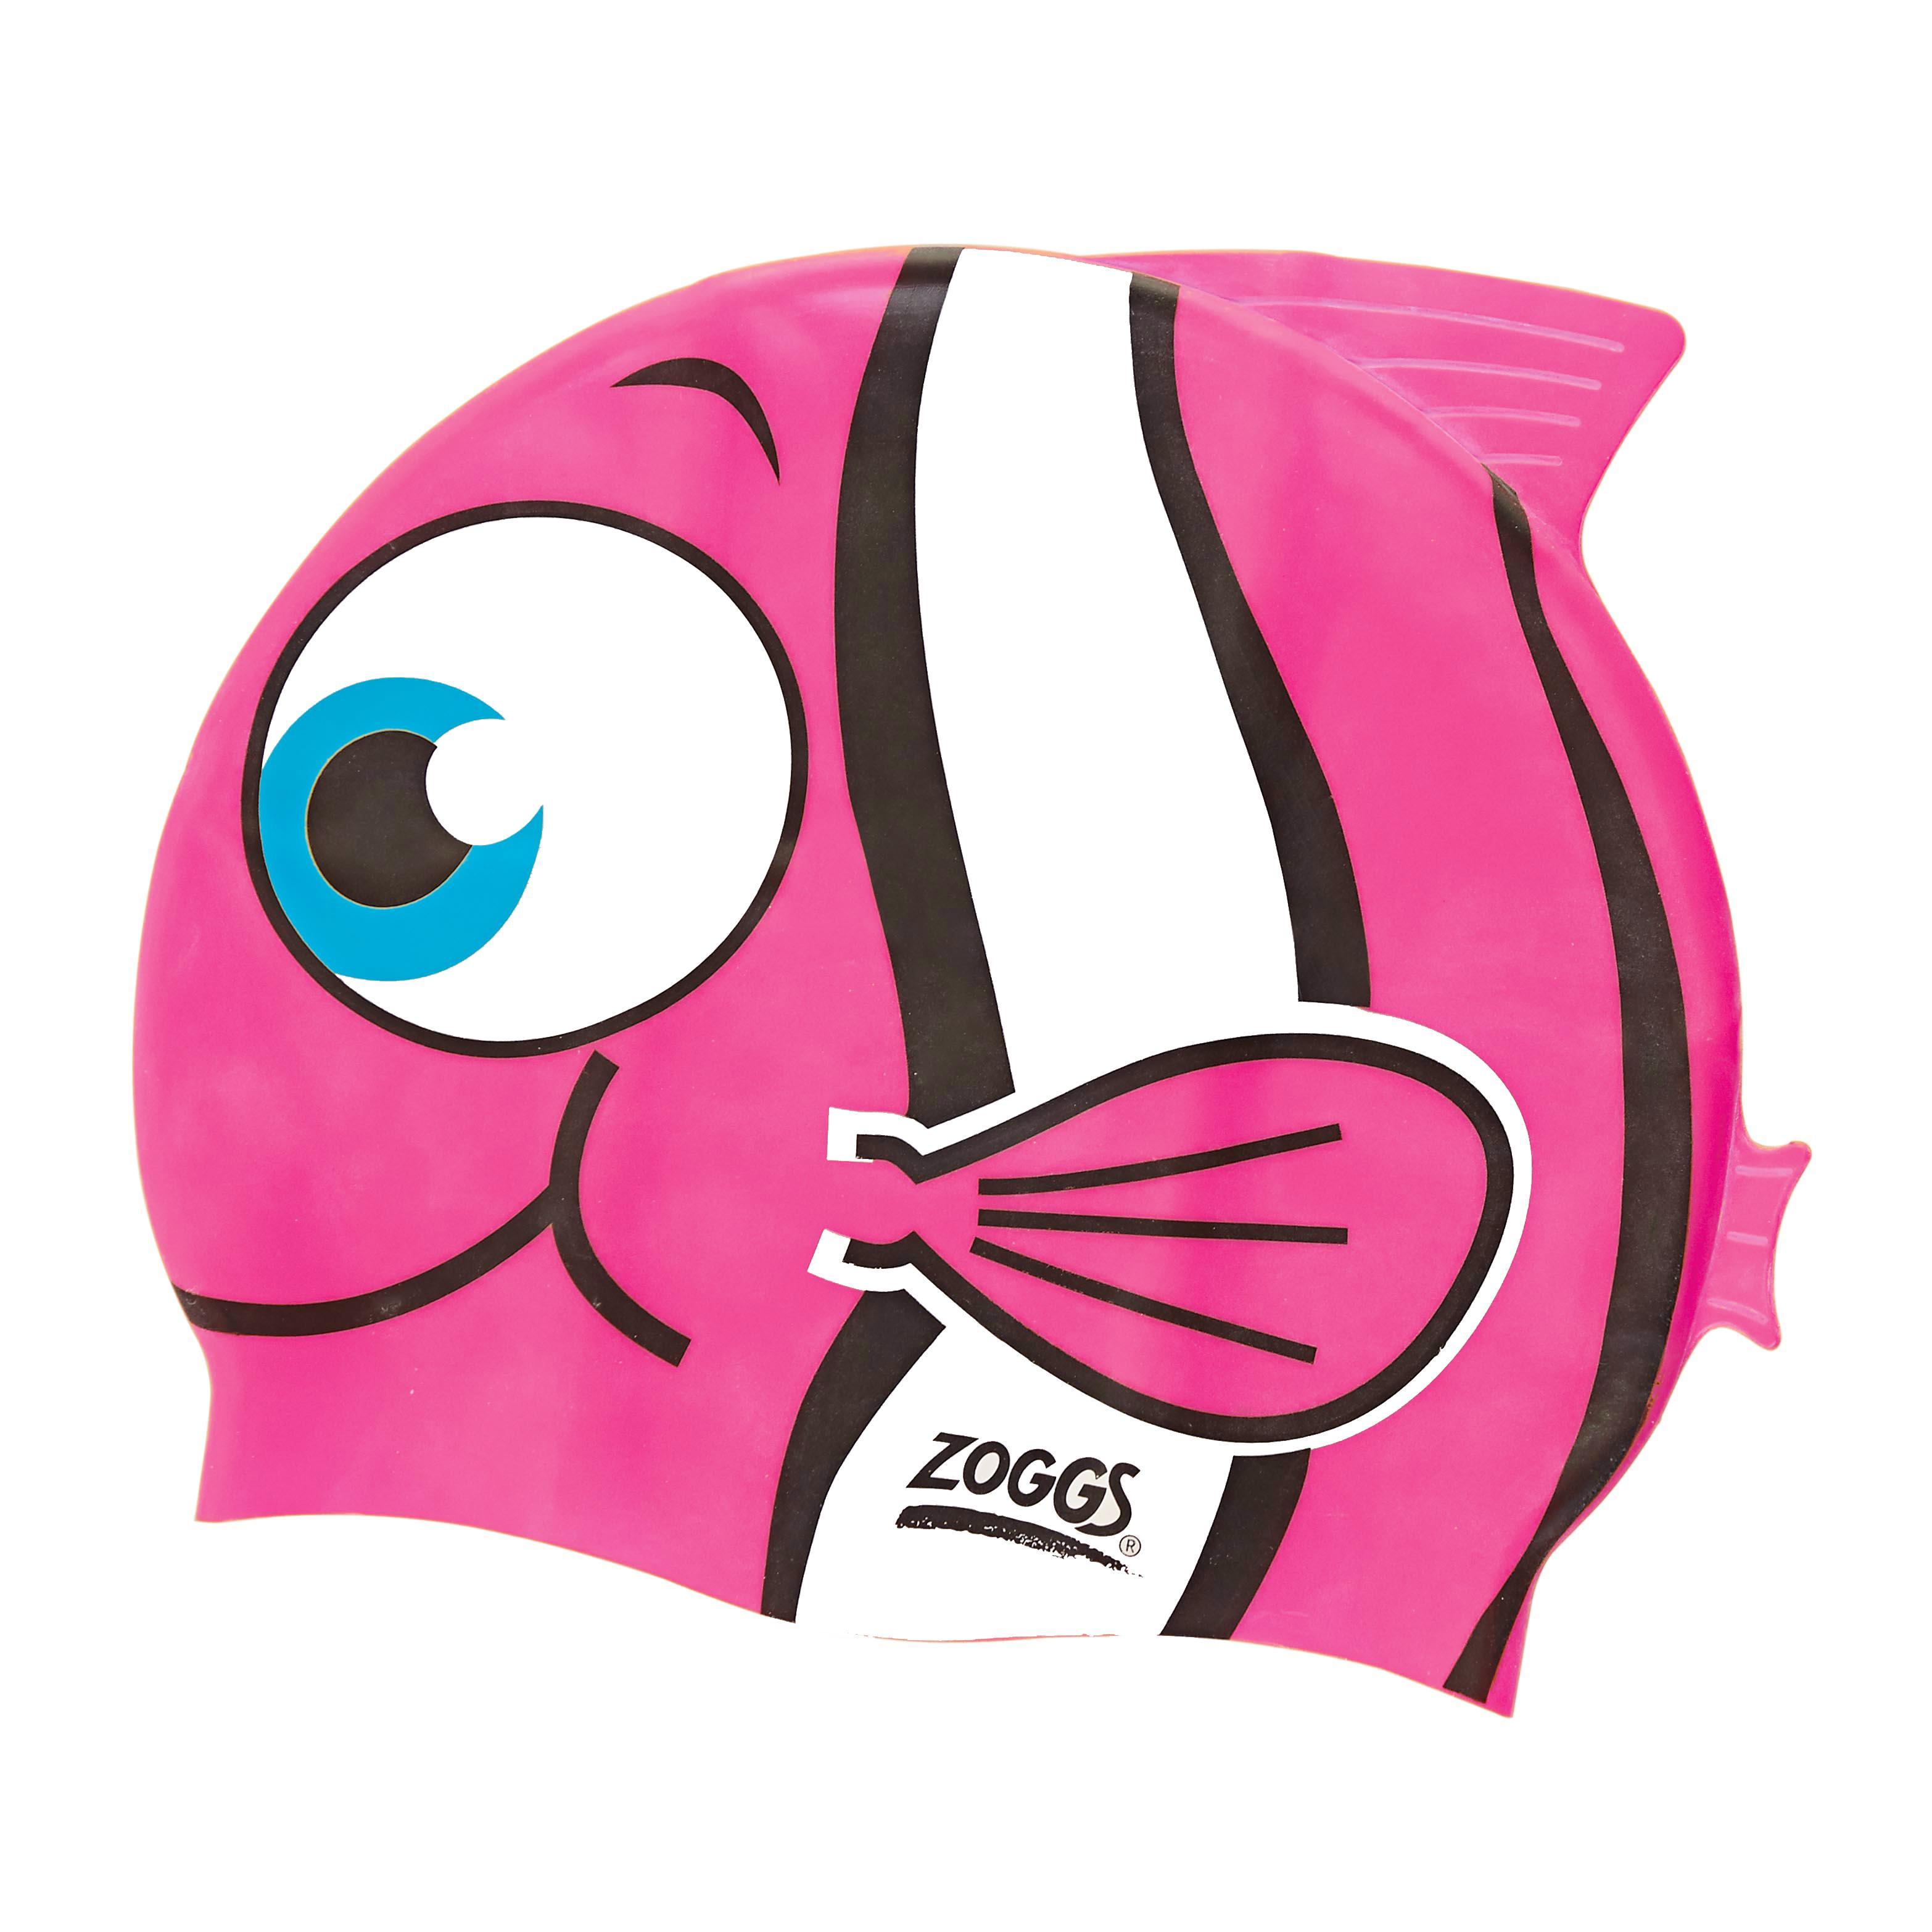 6be2e49c79f Latest Zoggs Swim Caps Products | Enjoy Huge Discounts | Lazada SG